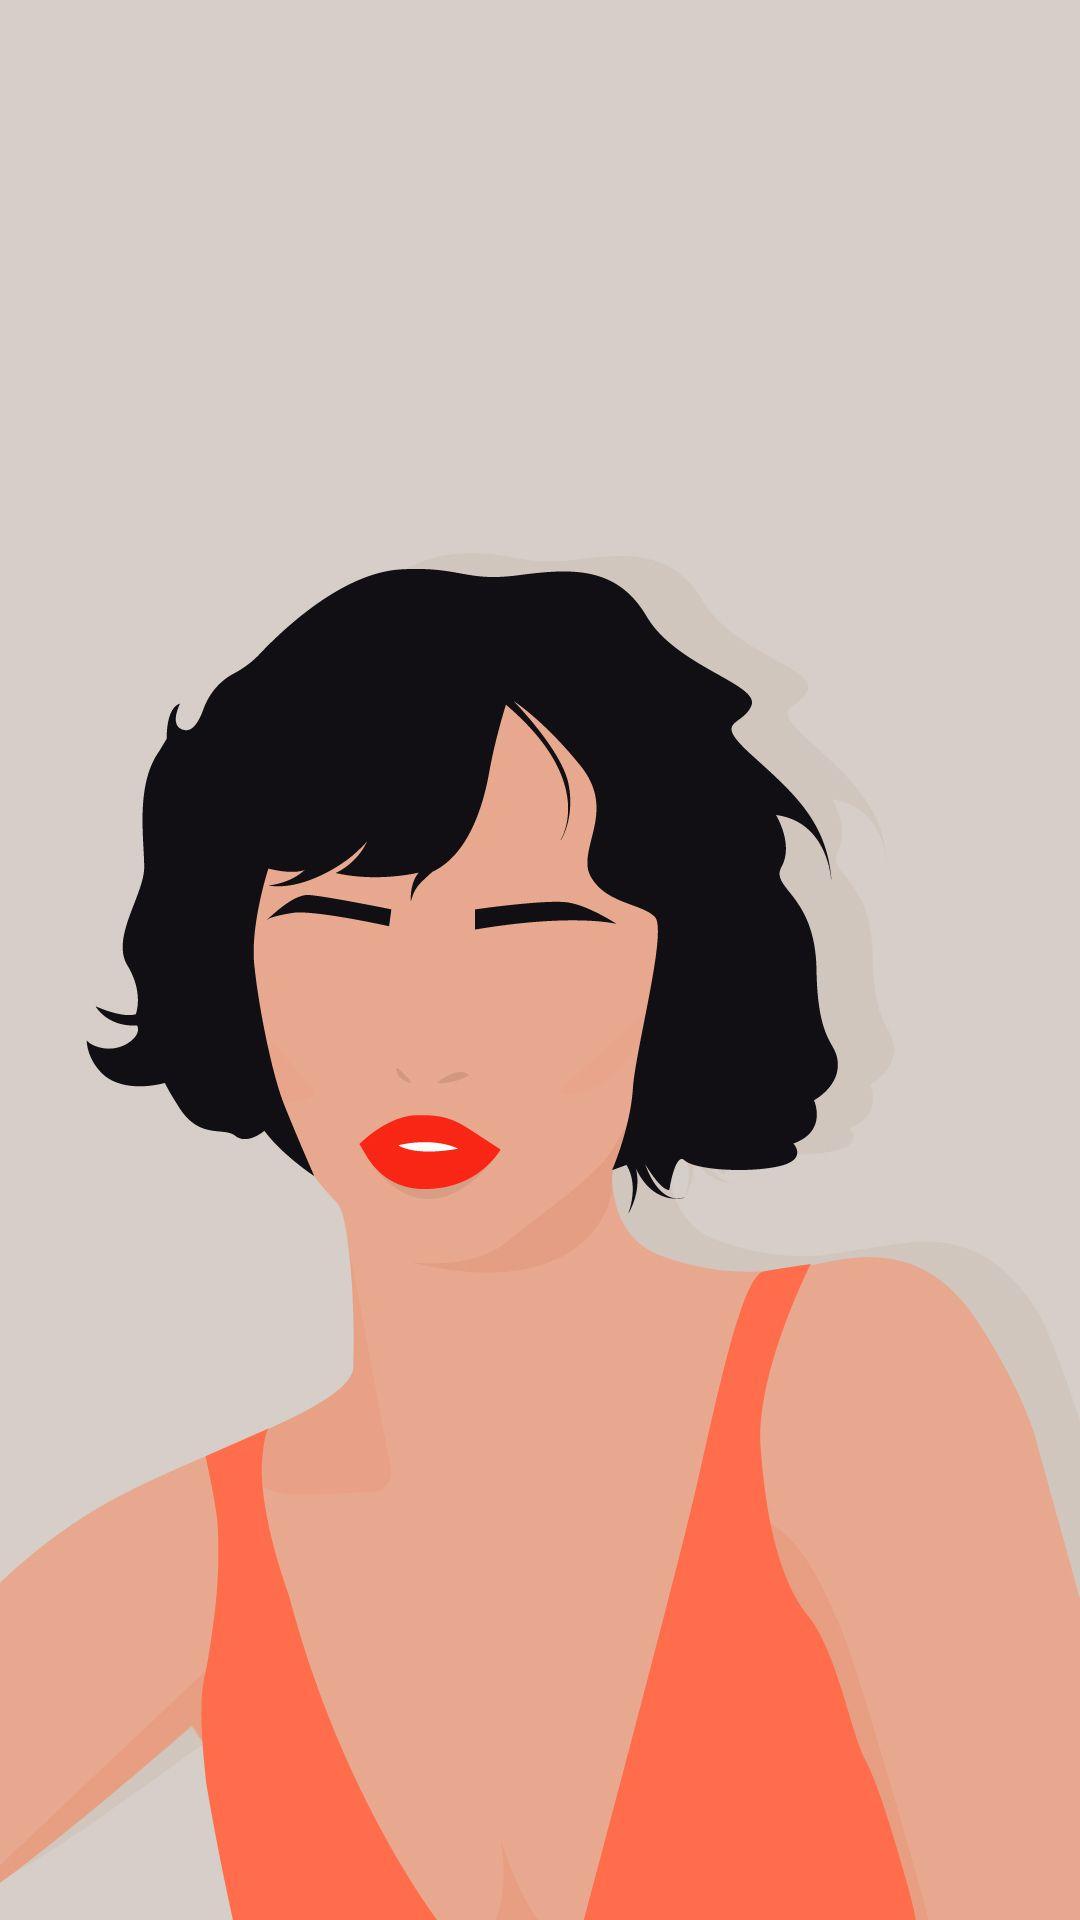 Girl Illustration Poster Designs